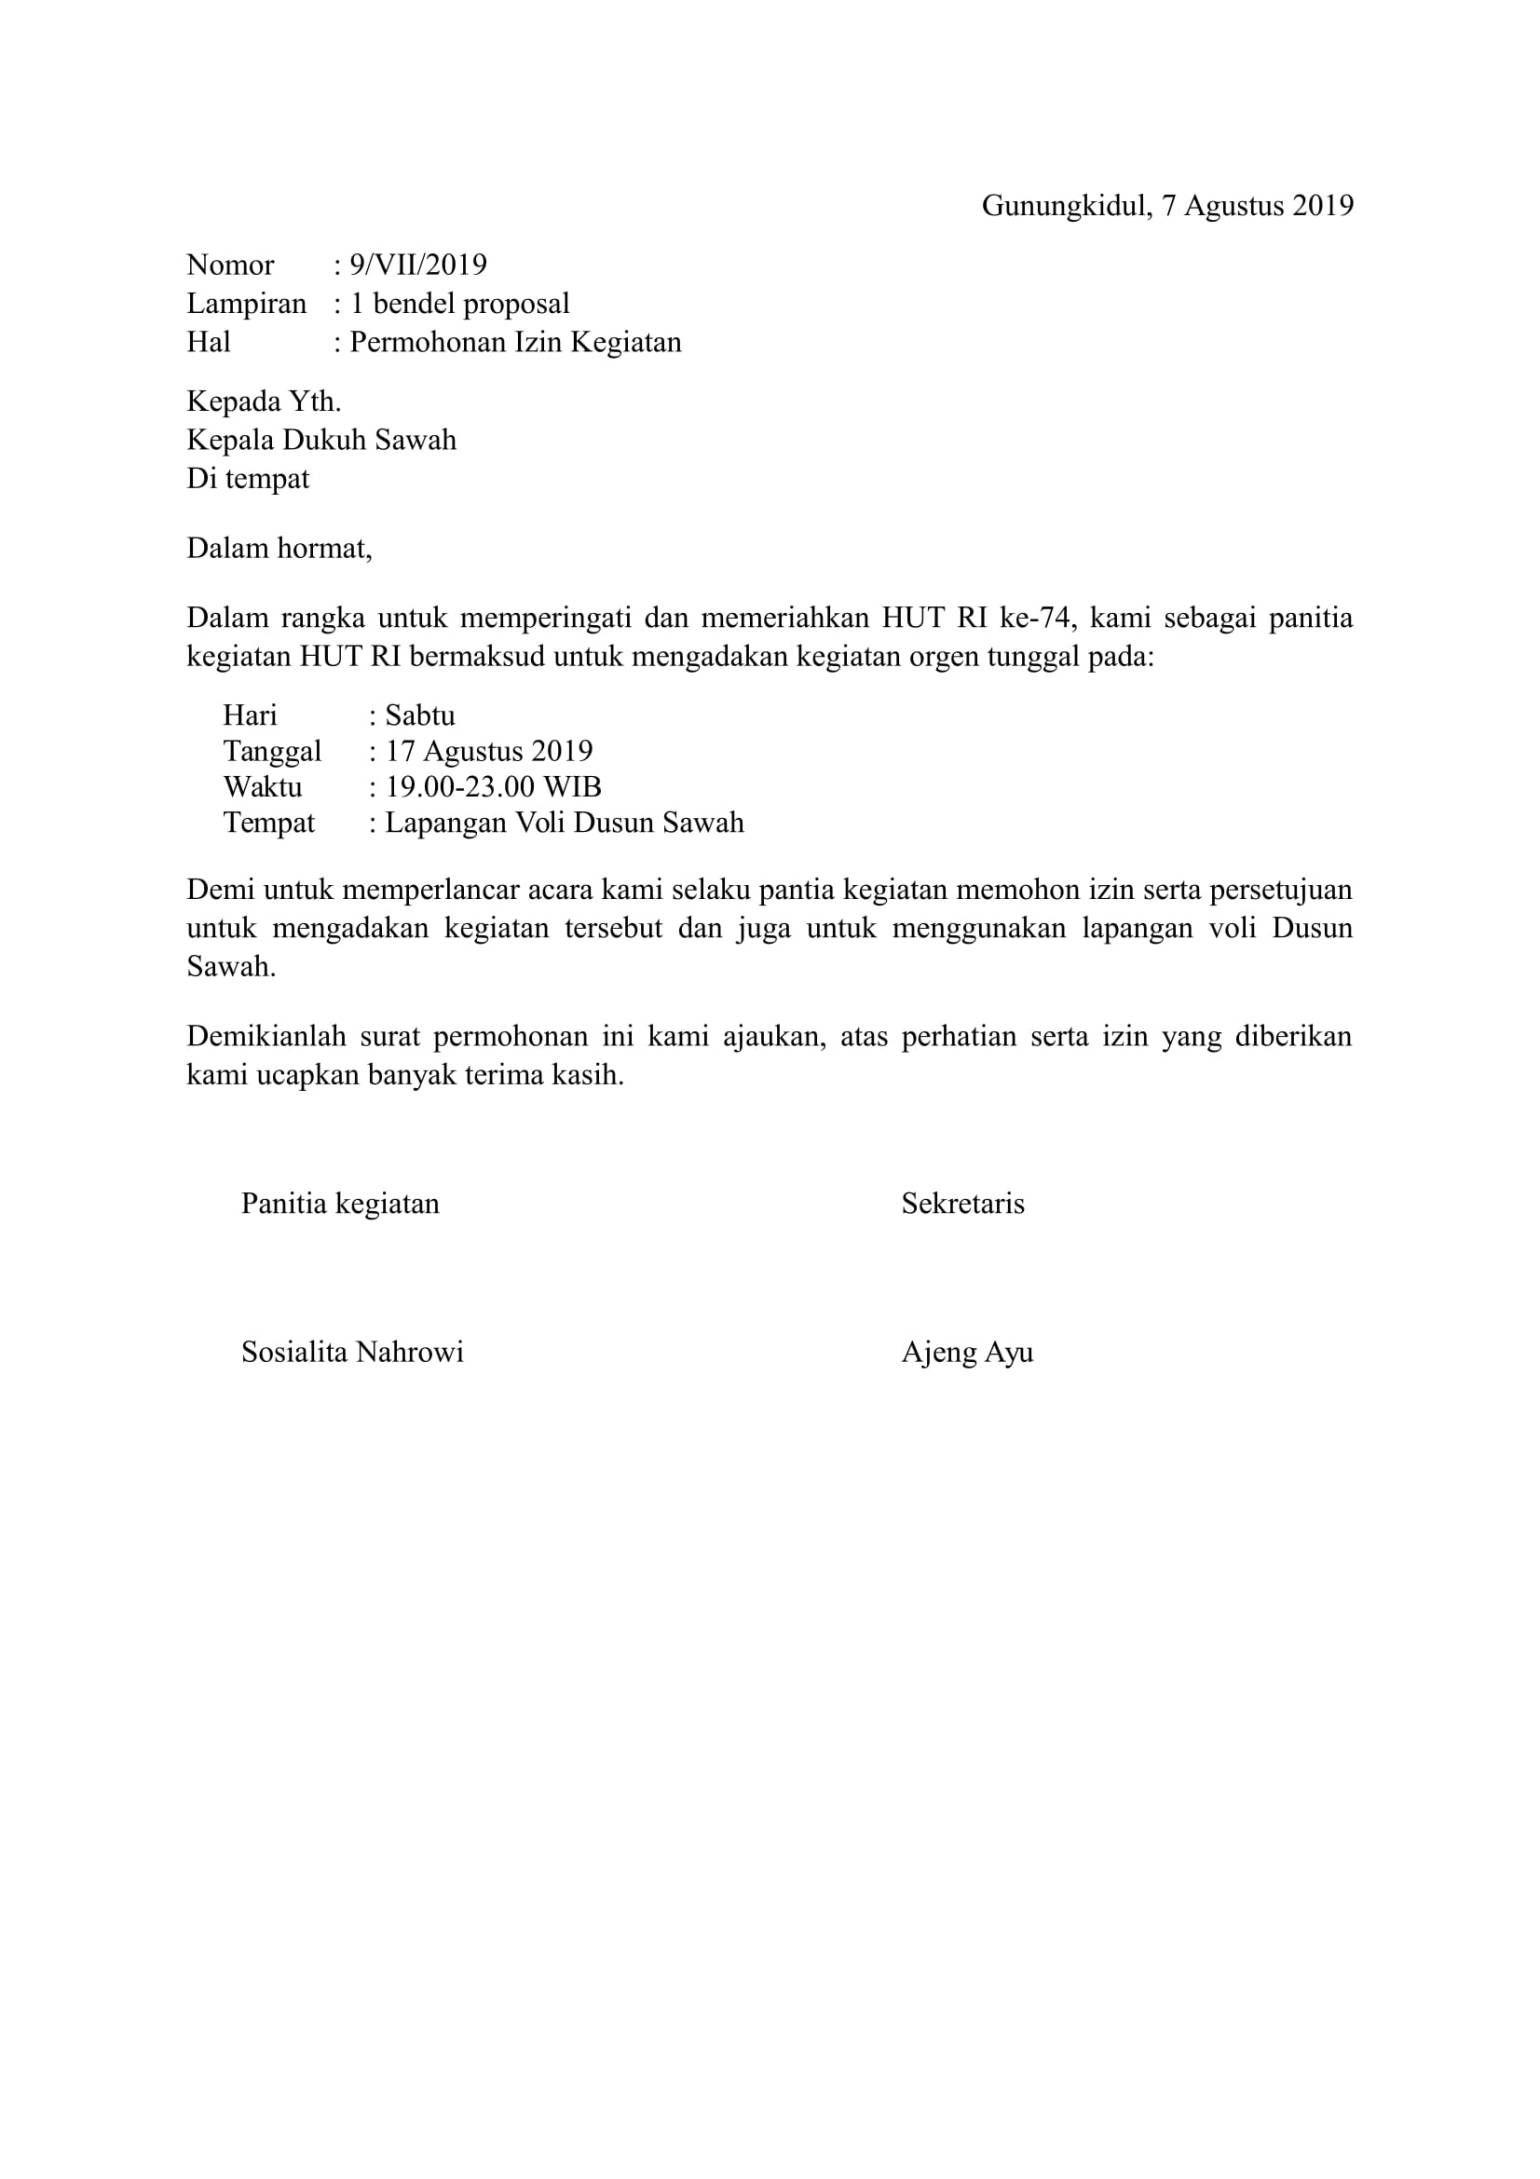 Contoh Surat Izin Surat Masuk Sekolah Sekolah